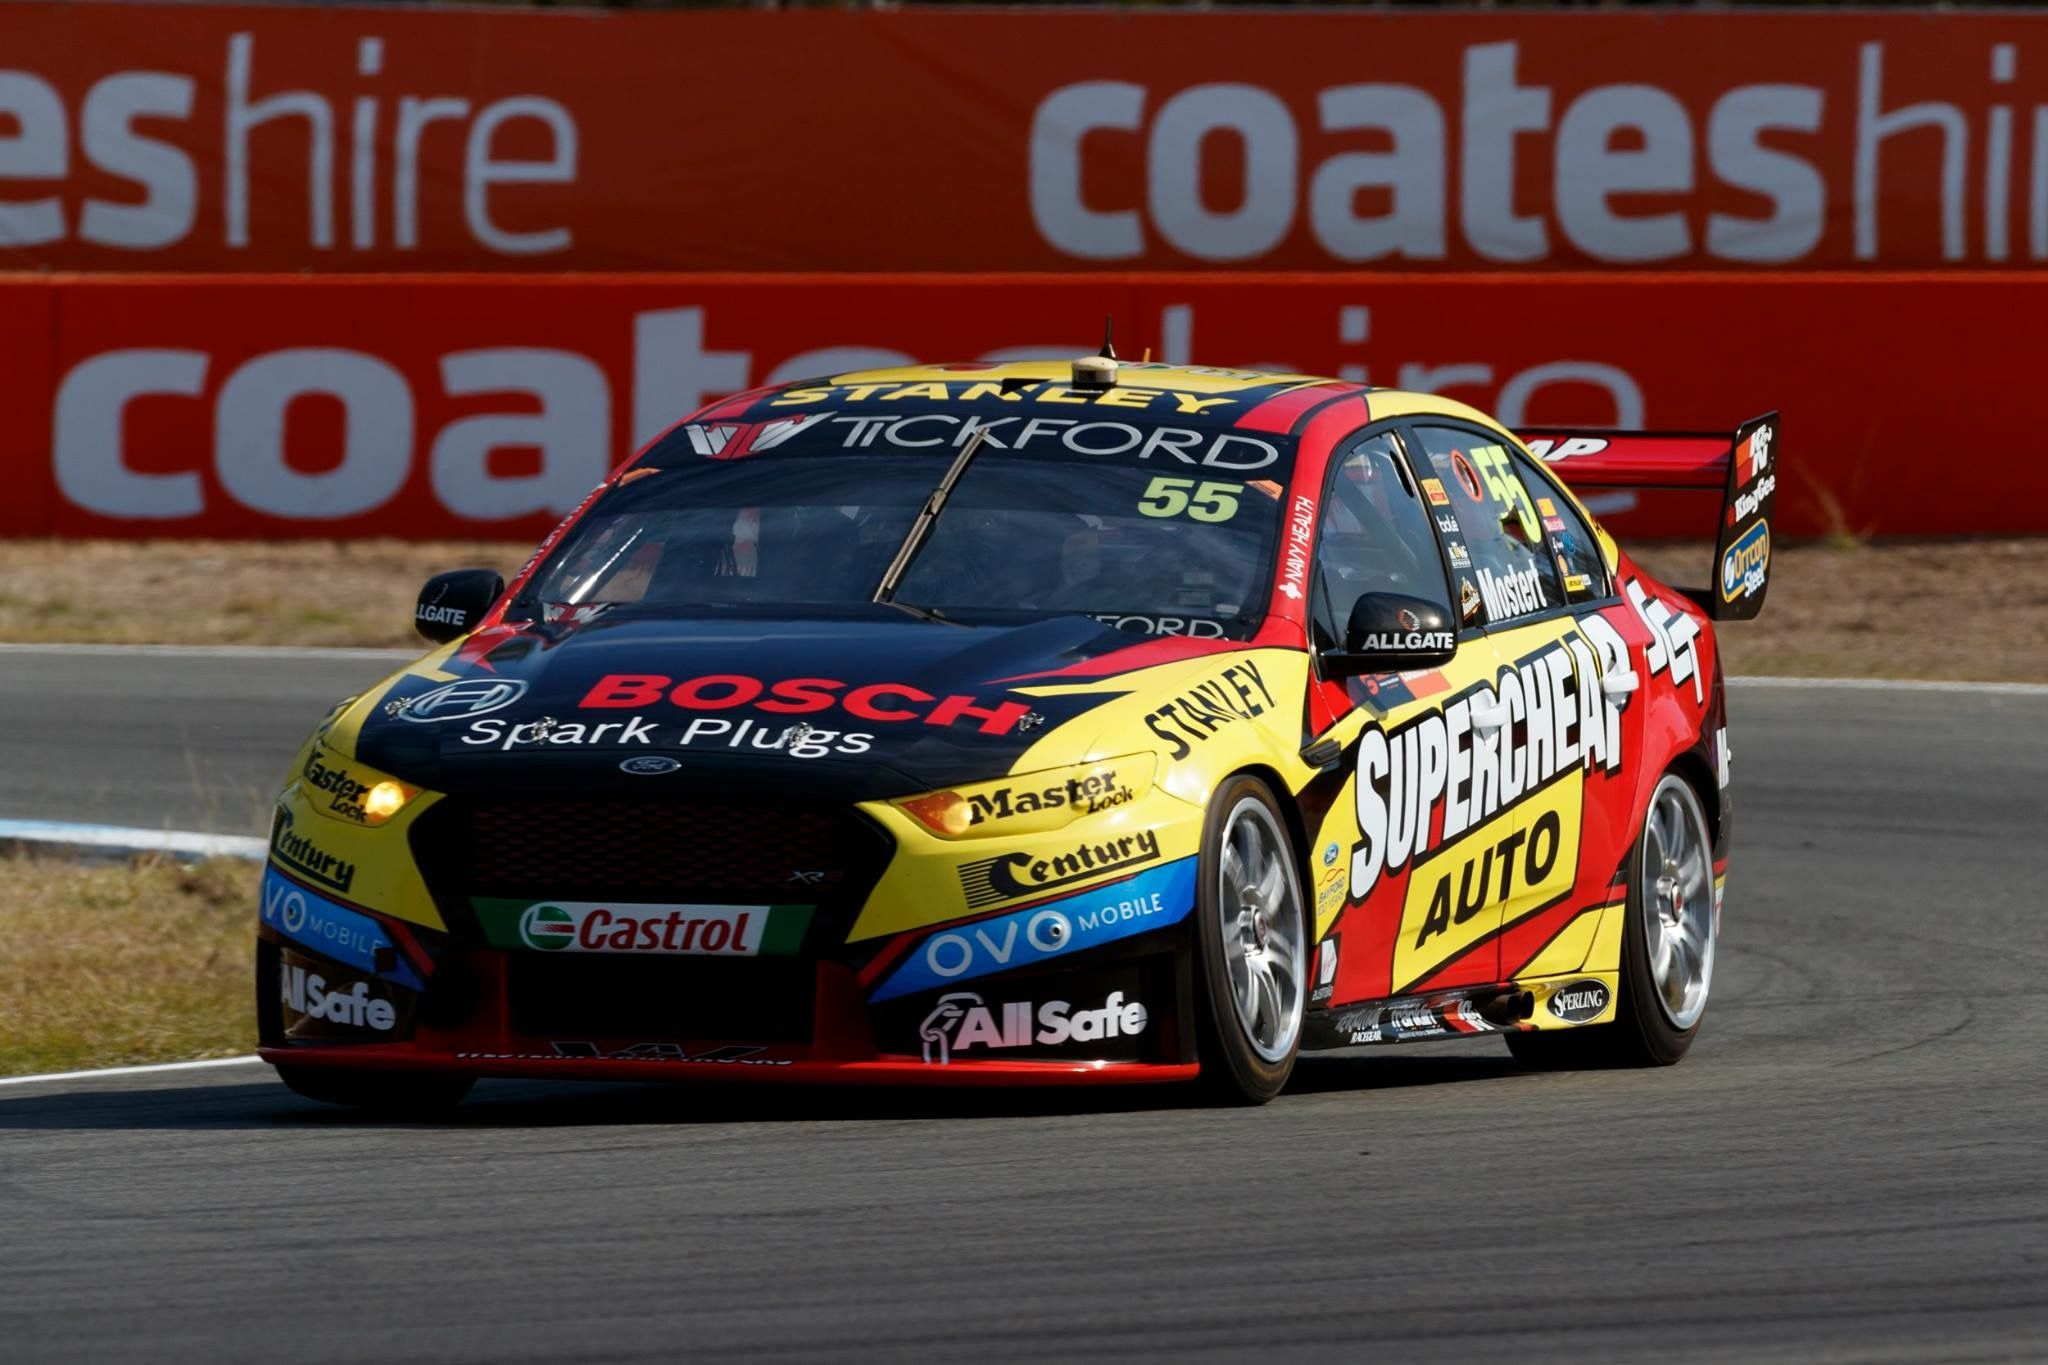 Pra Chaz Mostert 2017 Qld Raceway V8 Supercars Australia Super Cars Australian V8 Supercars